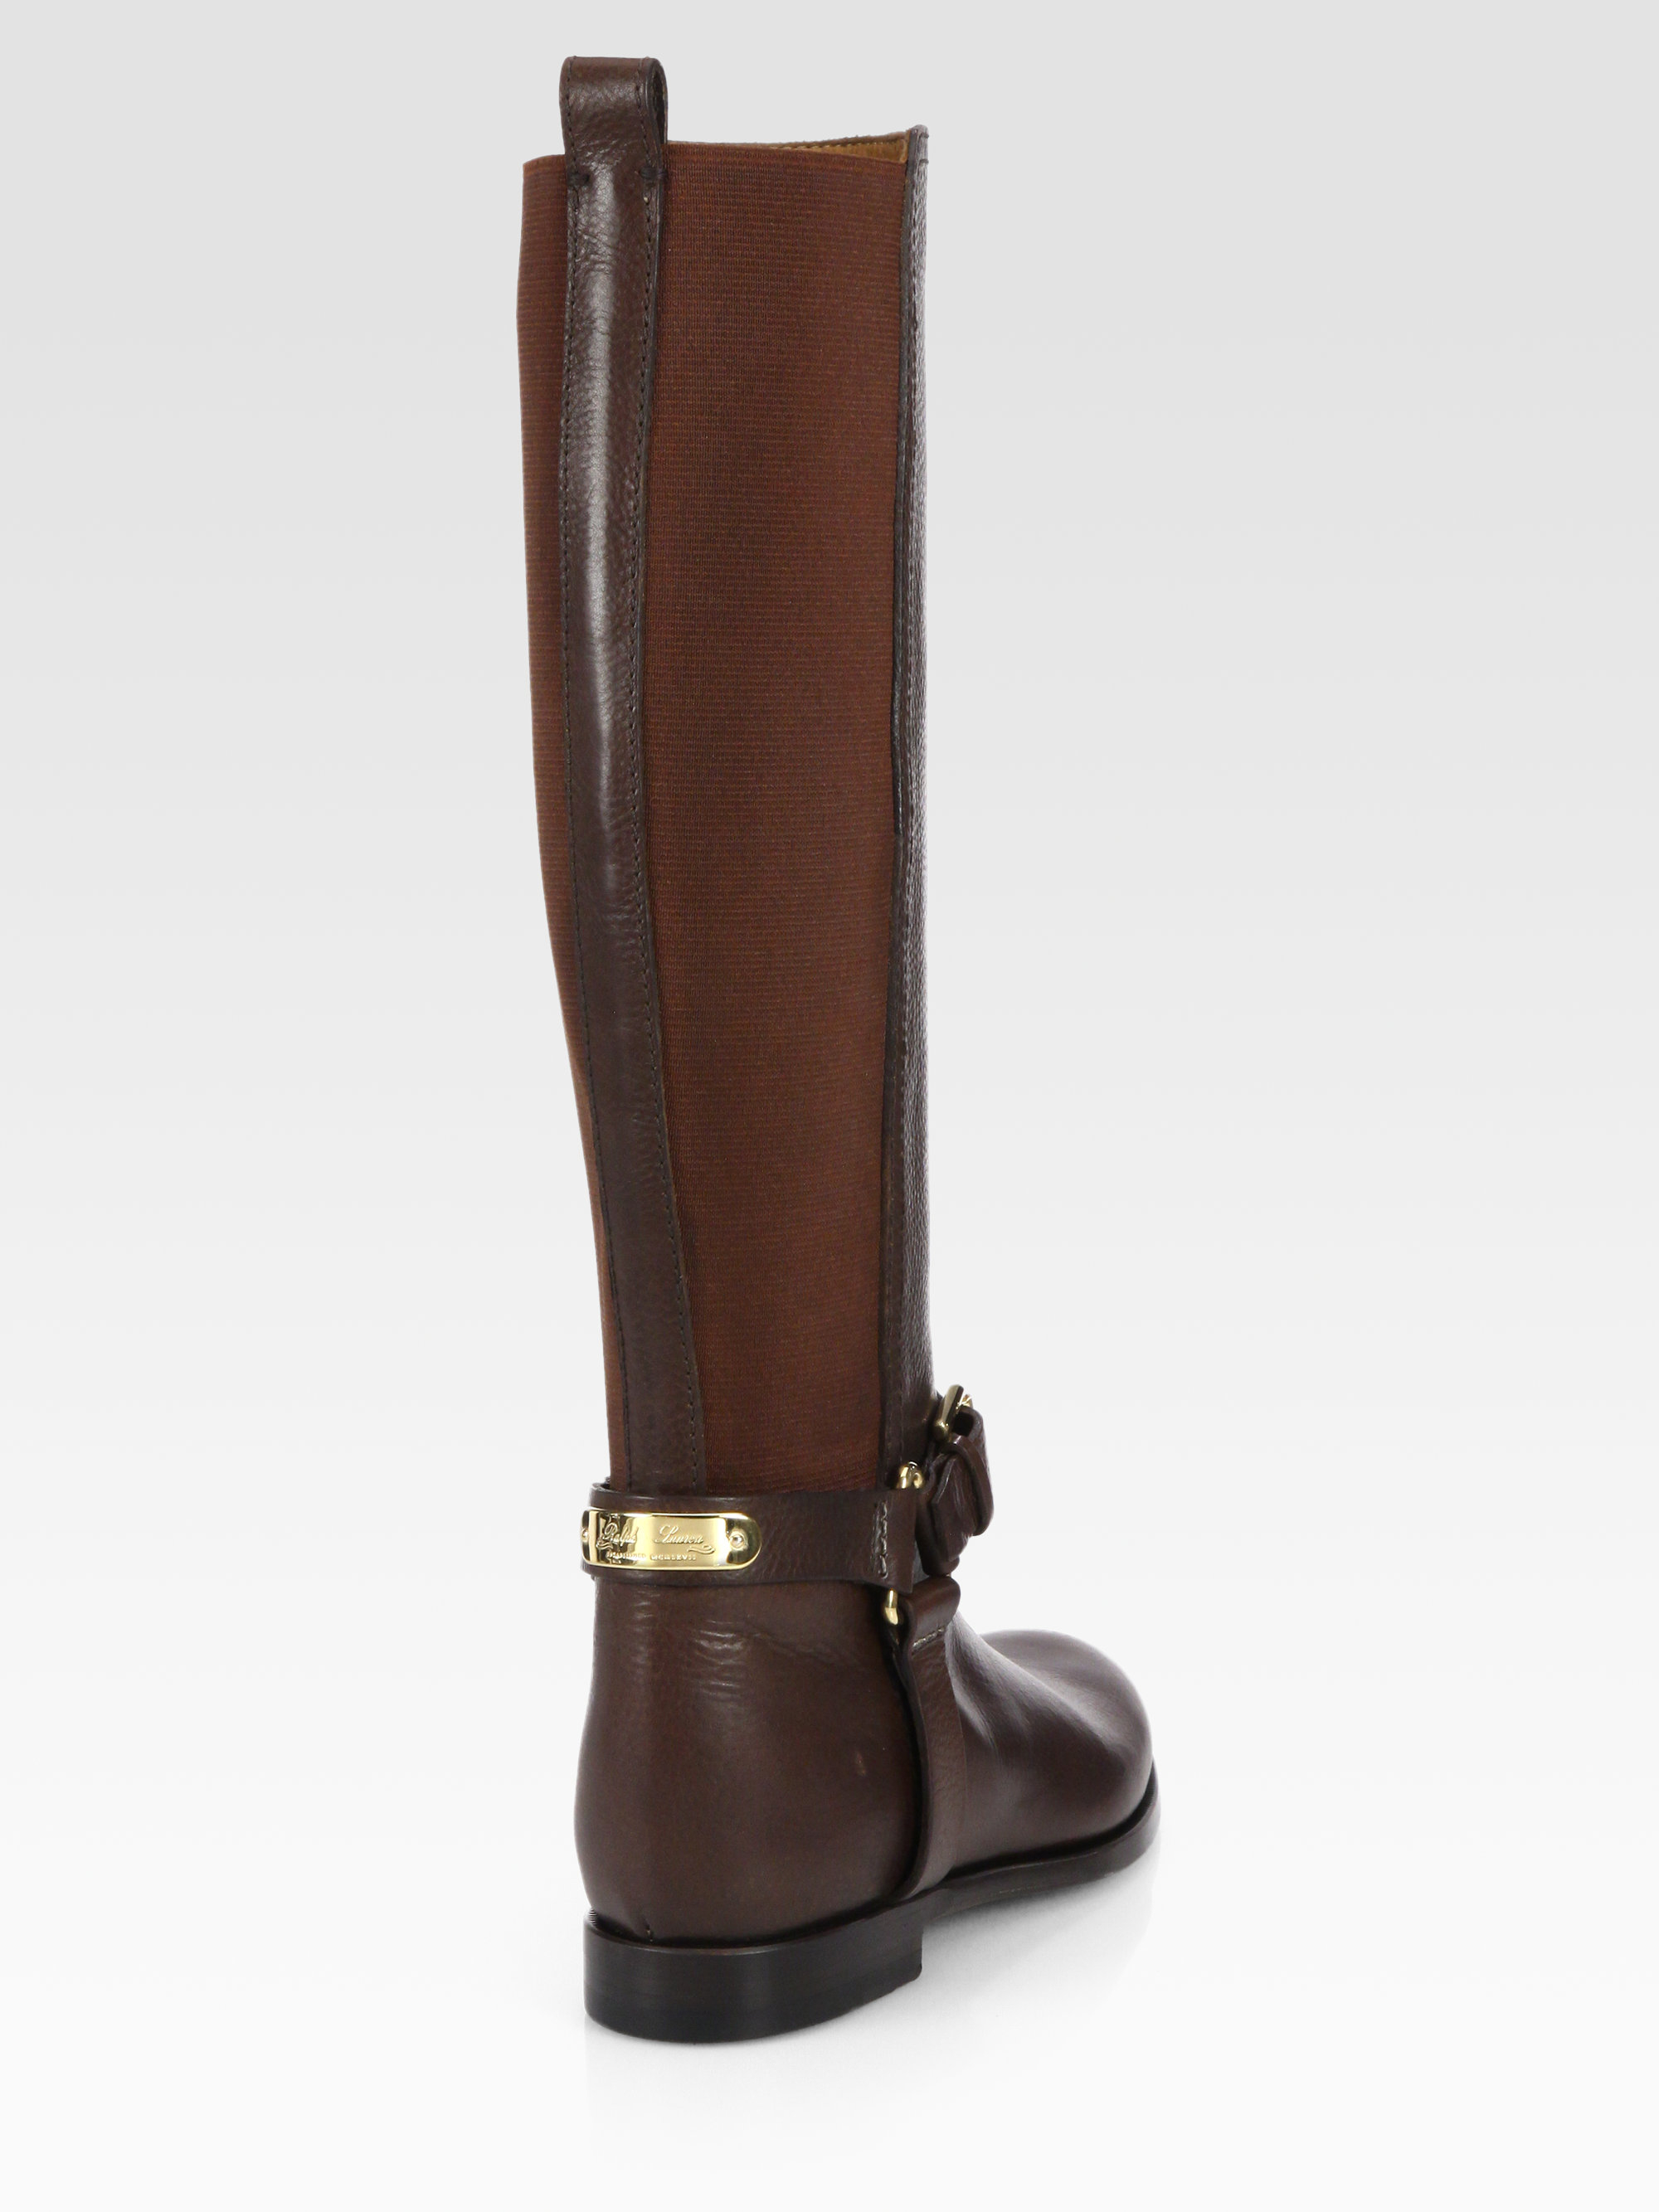 Ralph Lauren Shoes Women Collection